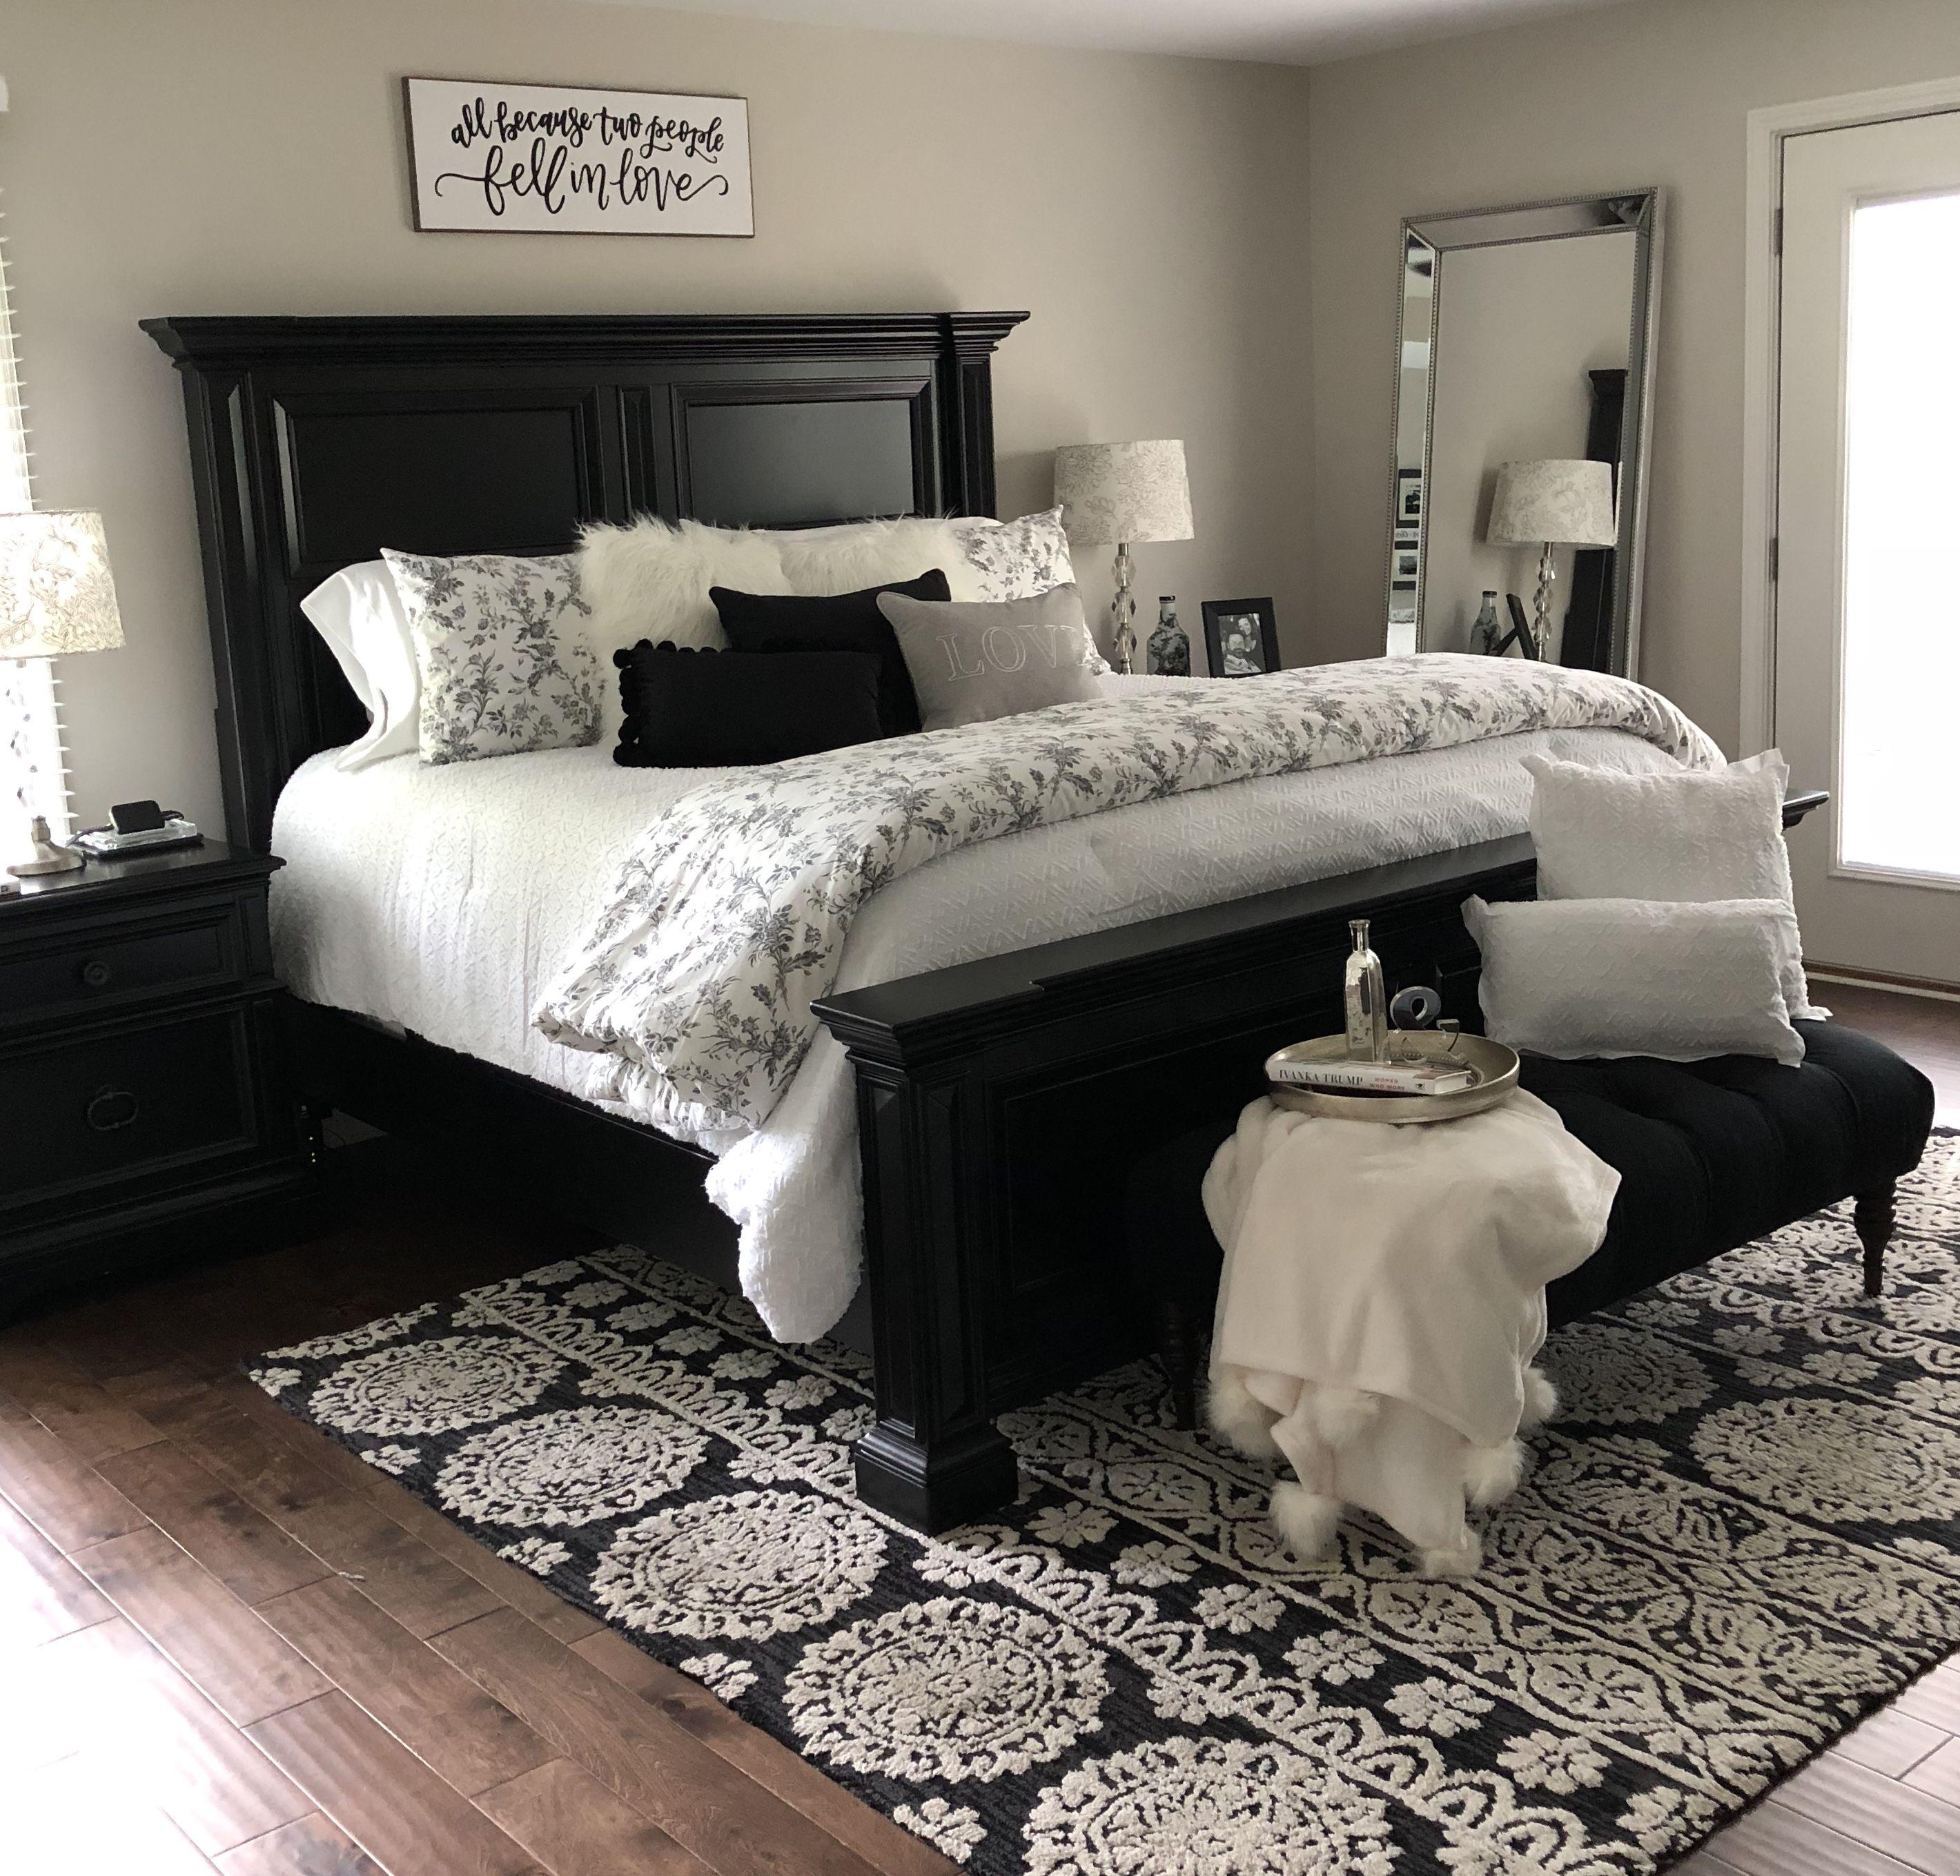 Black And White Master Bedroom Bedroom Decor Master For Couples Bedroom Decor For Couples Master Bedrooms Decor Master bedroom ideas black